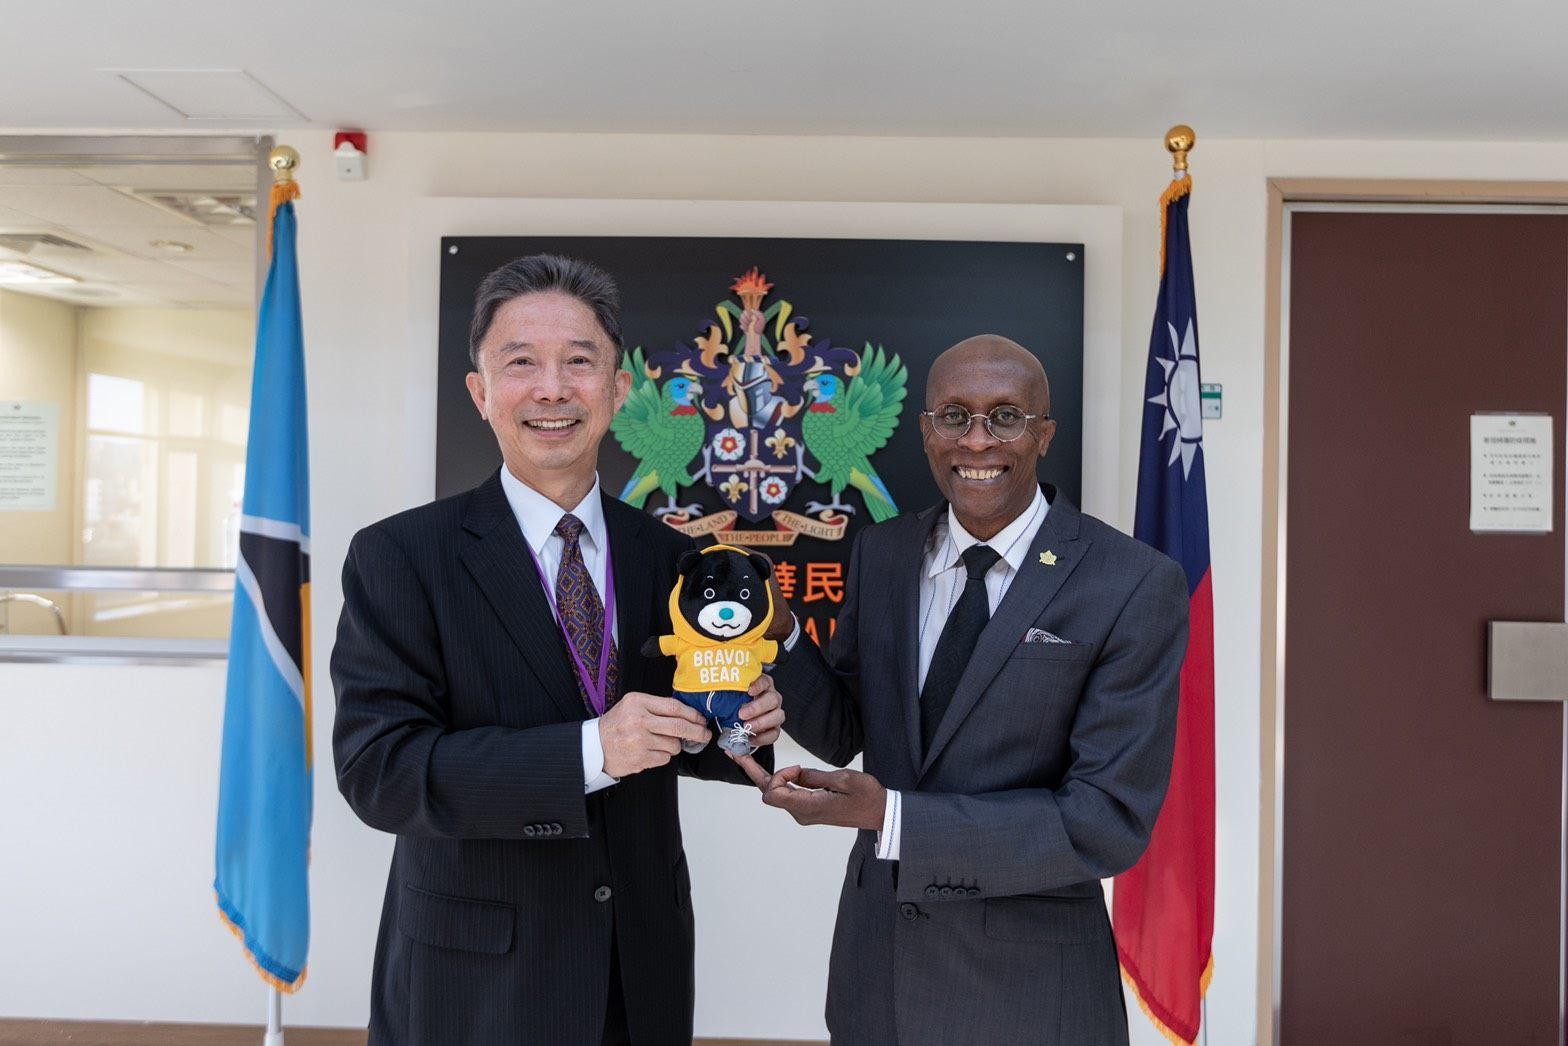 Ambassador Tom Chou visited the Embassy of Saint Lucia